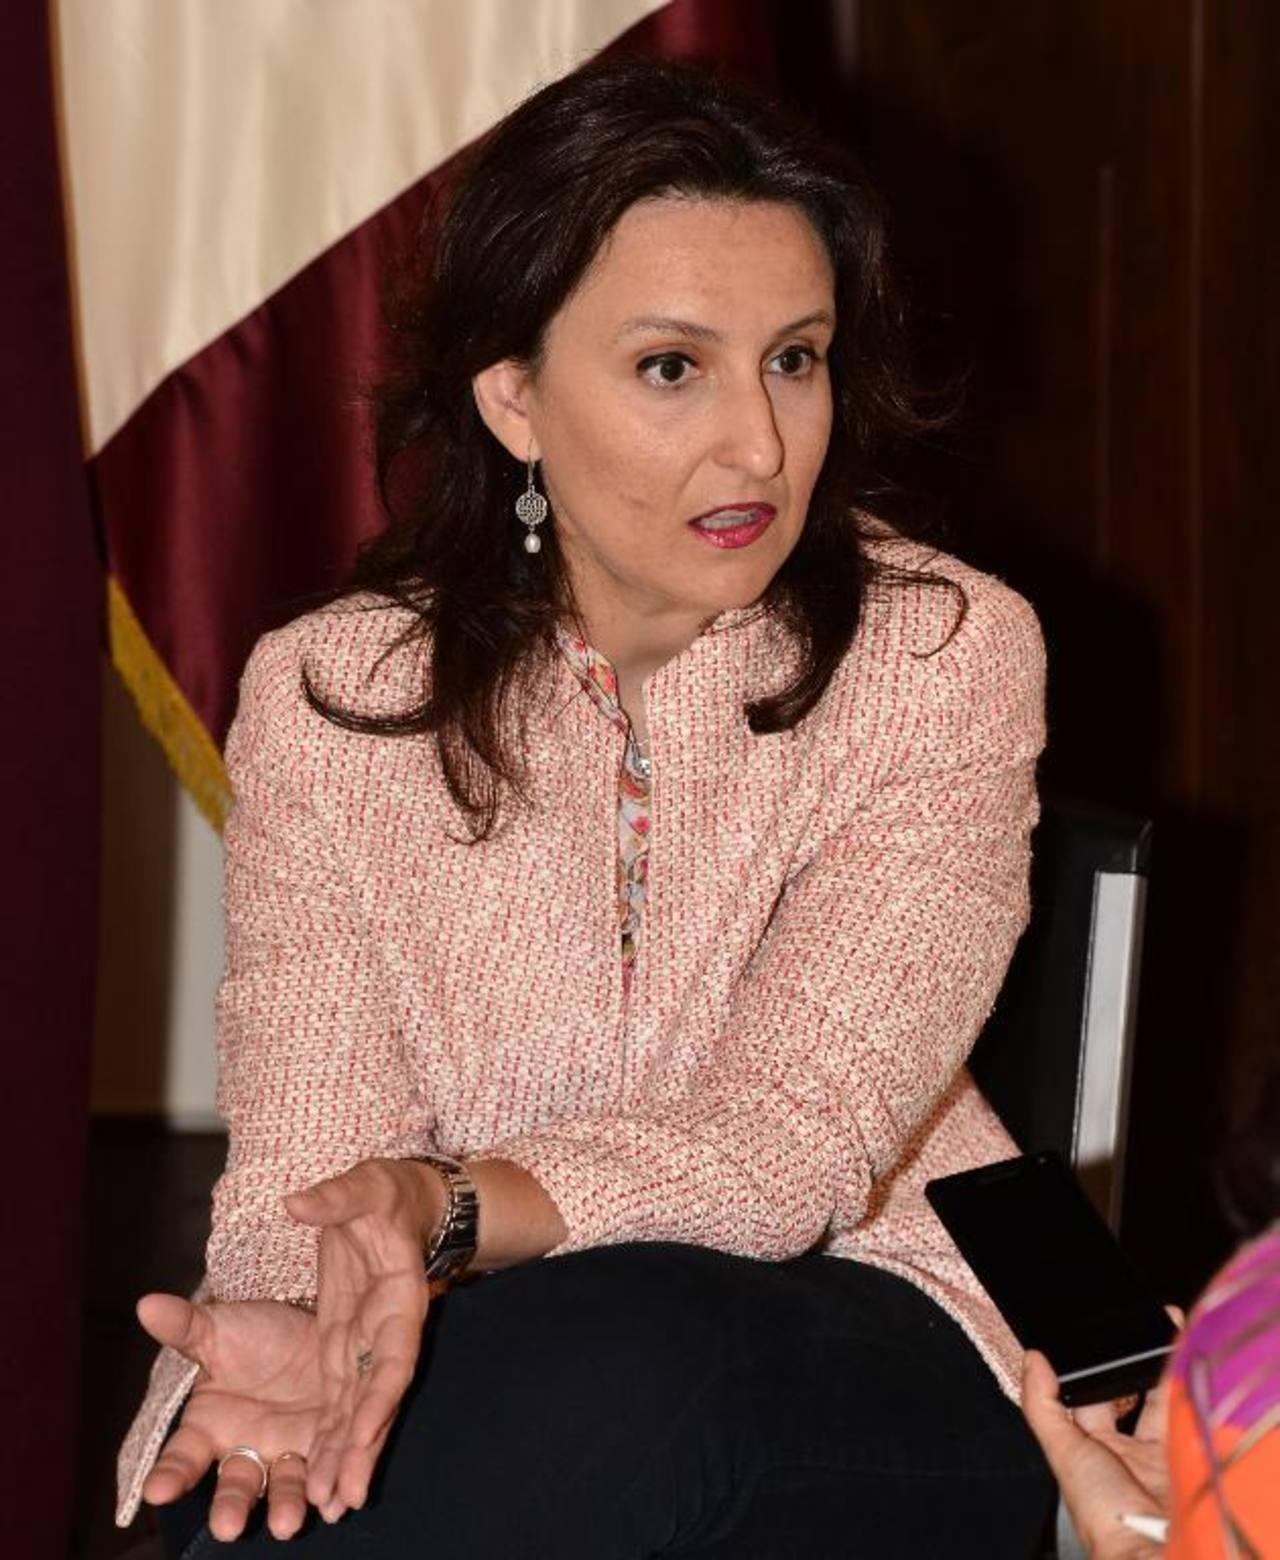 La sicóloga Esther López Zafra dicta cátedra en la Utec. Foto EDH / Omar carbonero